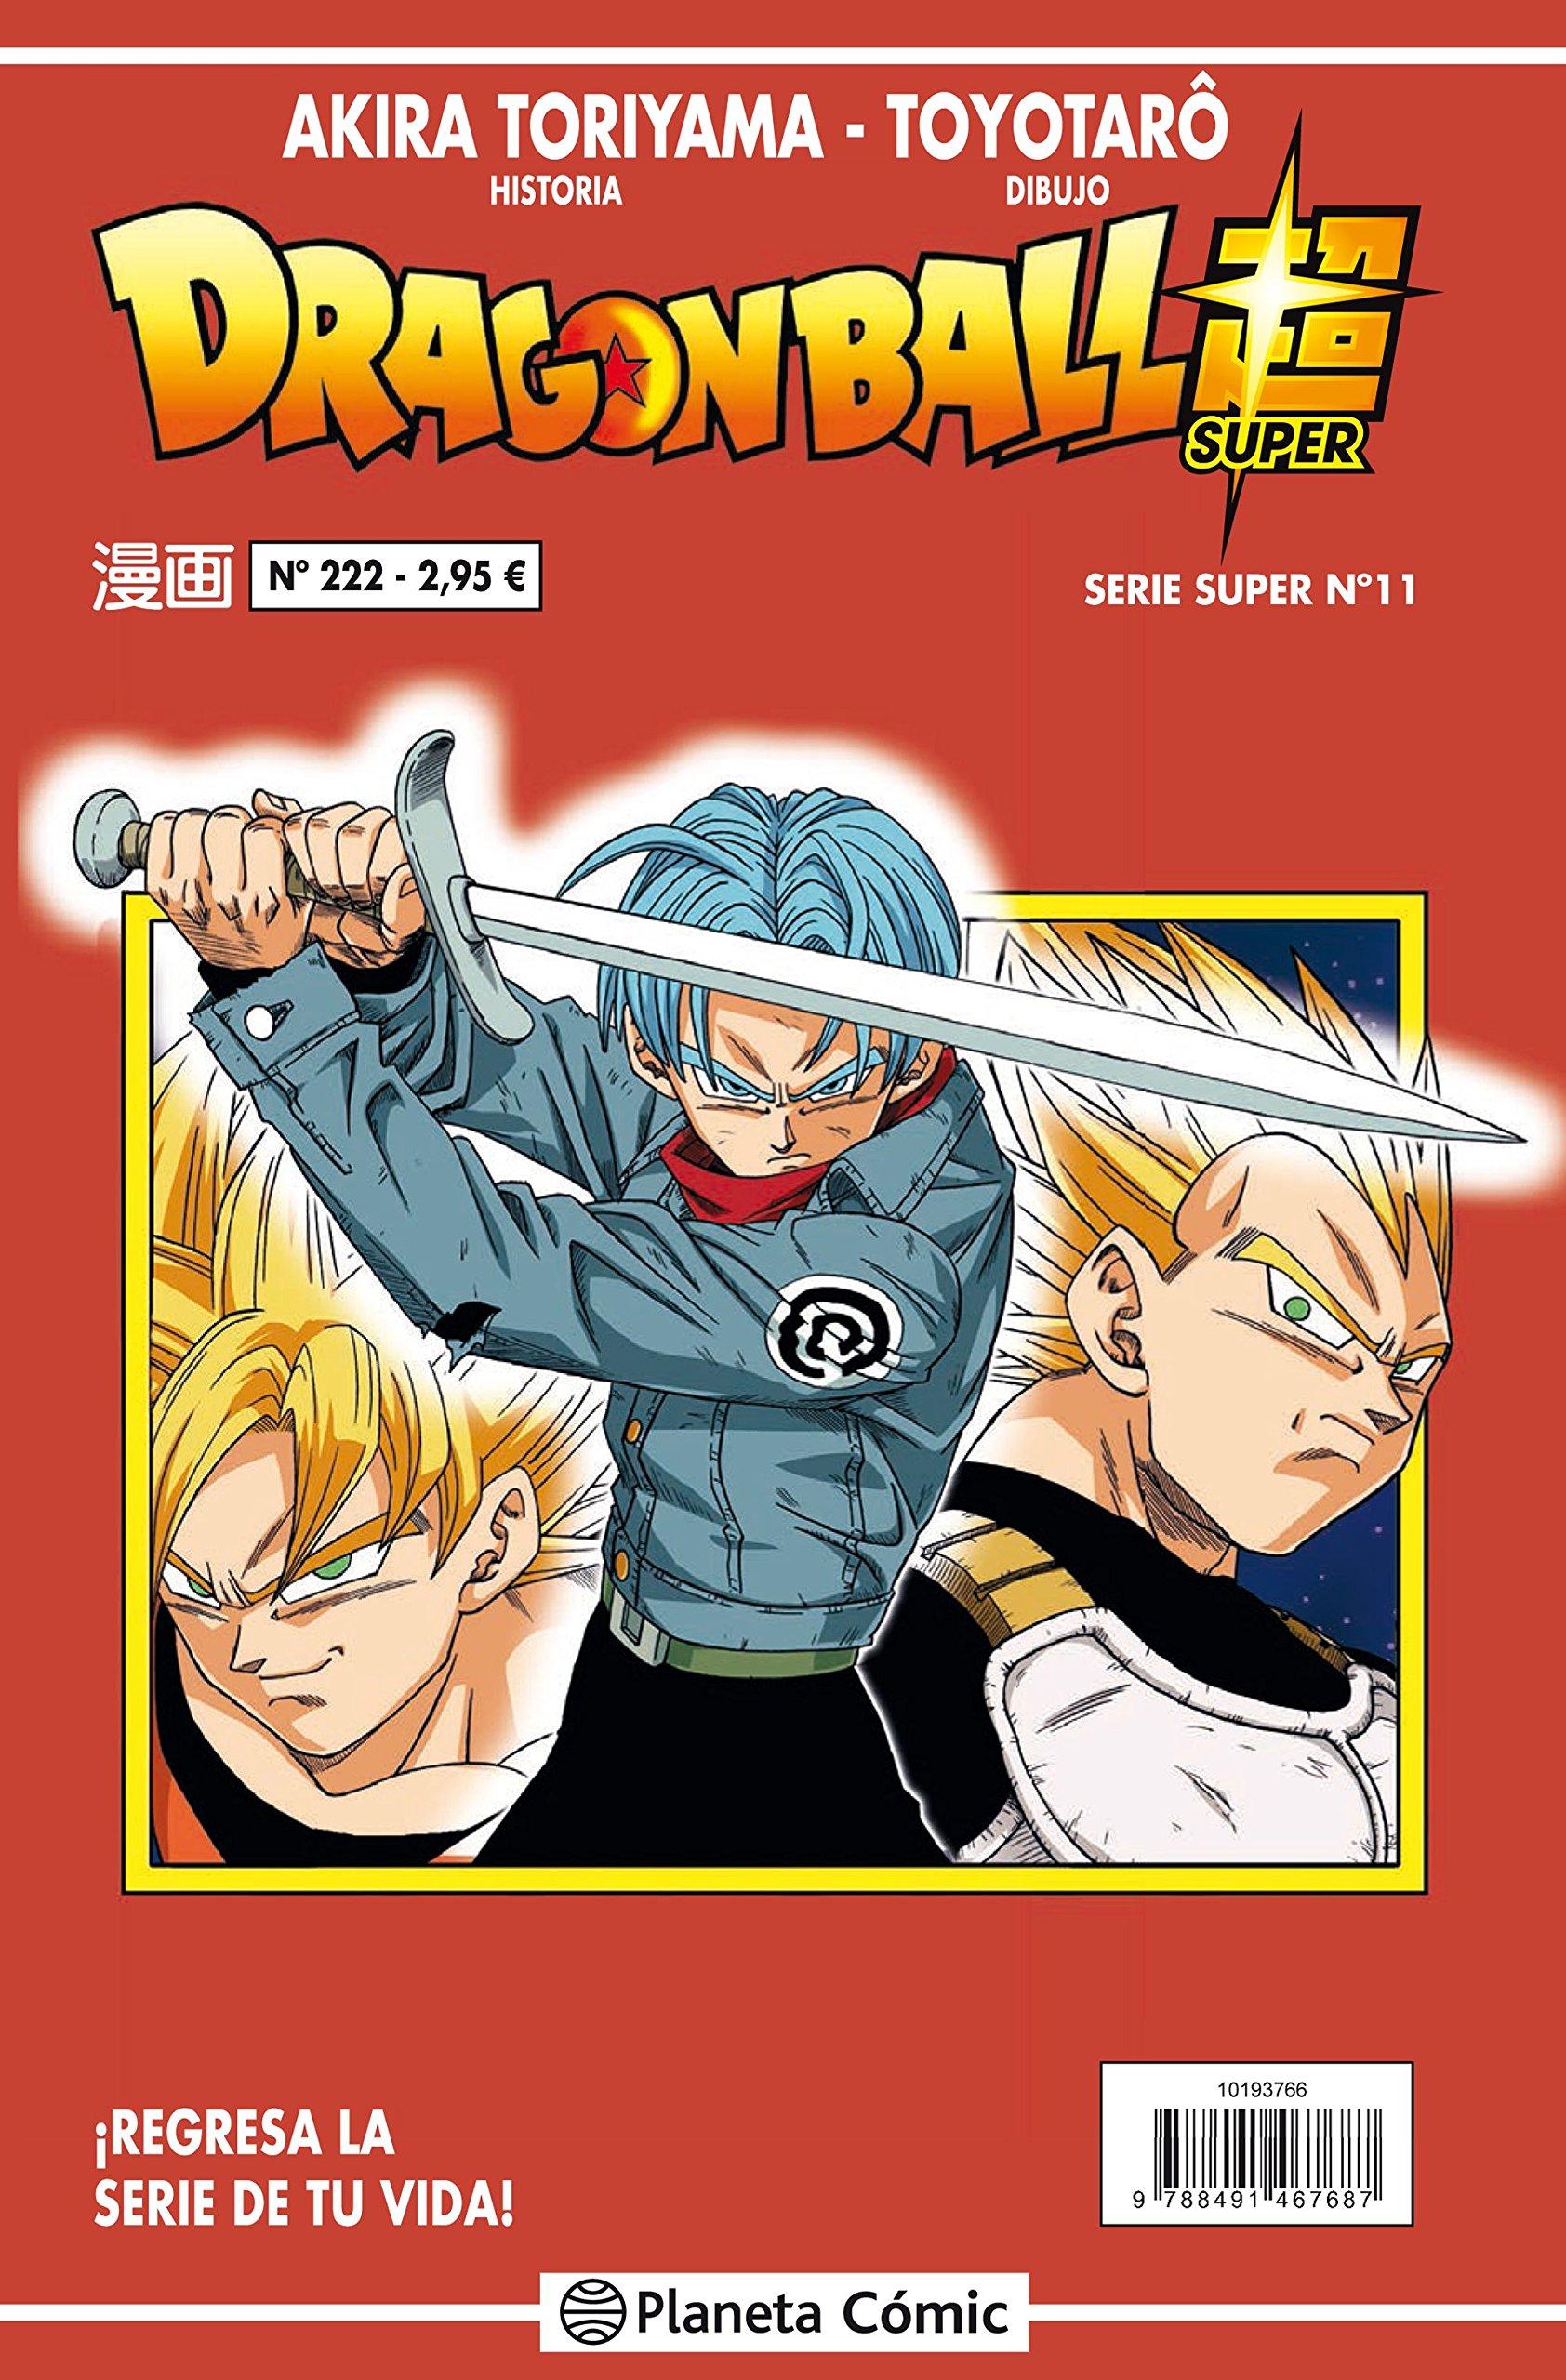 Dragon Ball Serie roja nº 222 (Manga Shonen) Tapa blanda – 18 sep 2018 Akira Toriyama Daruma Planeta DeAgostini Cómics 8491731342